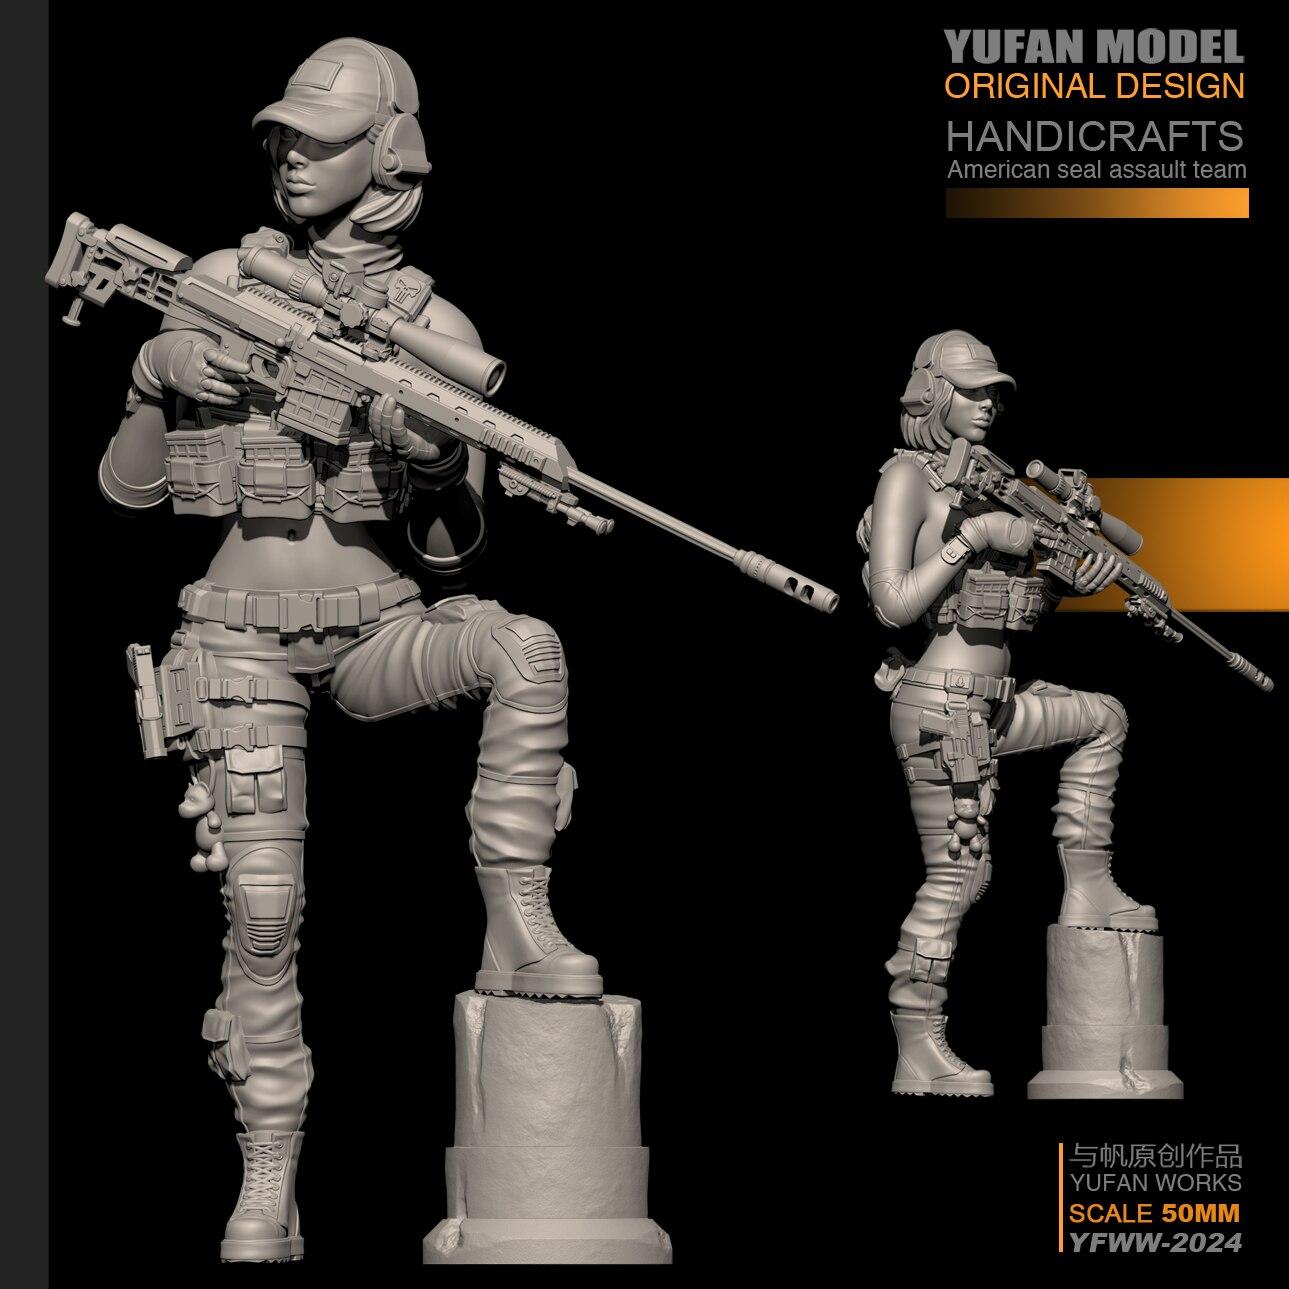 YUFan sniper soldado resina Modelo 1/35 Kits de Resina do sexo feminino Auto-montado YFWW35-2024